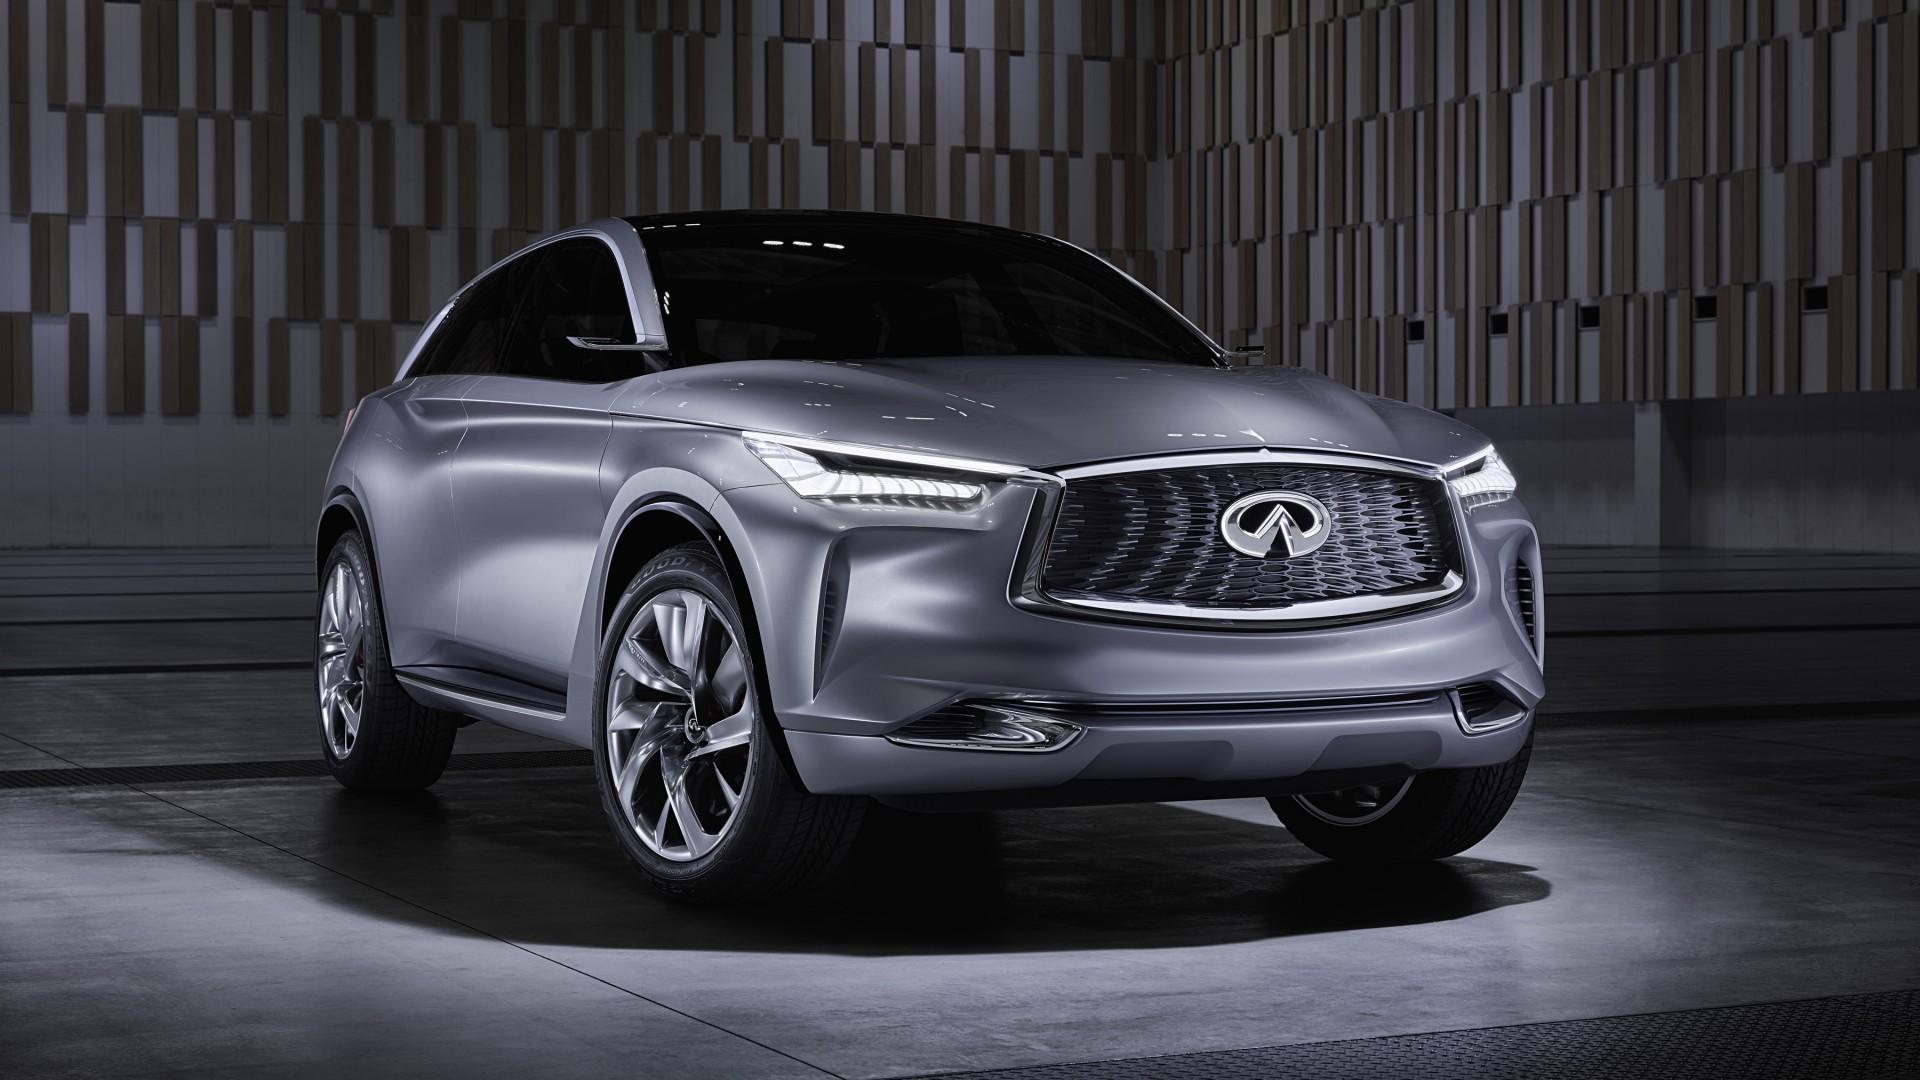 2019-infiniti-qx50-luxury-crossover